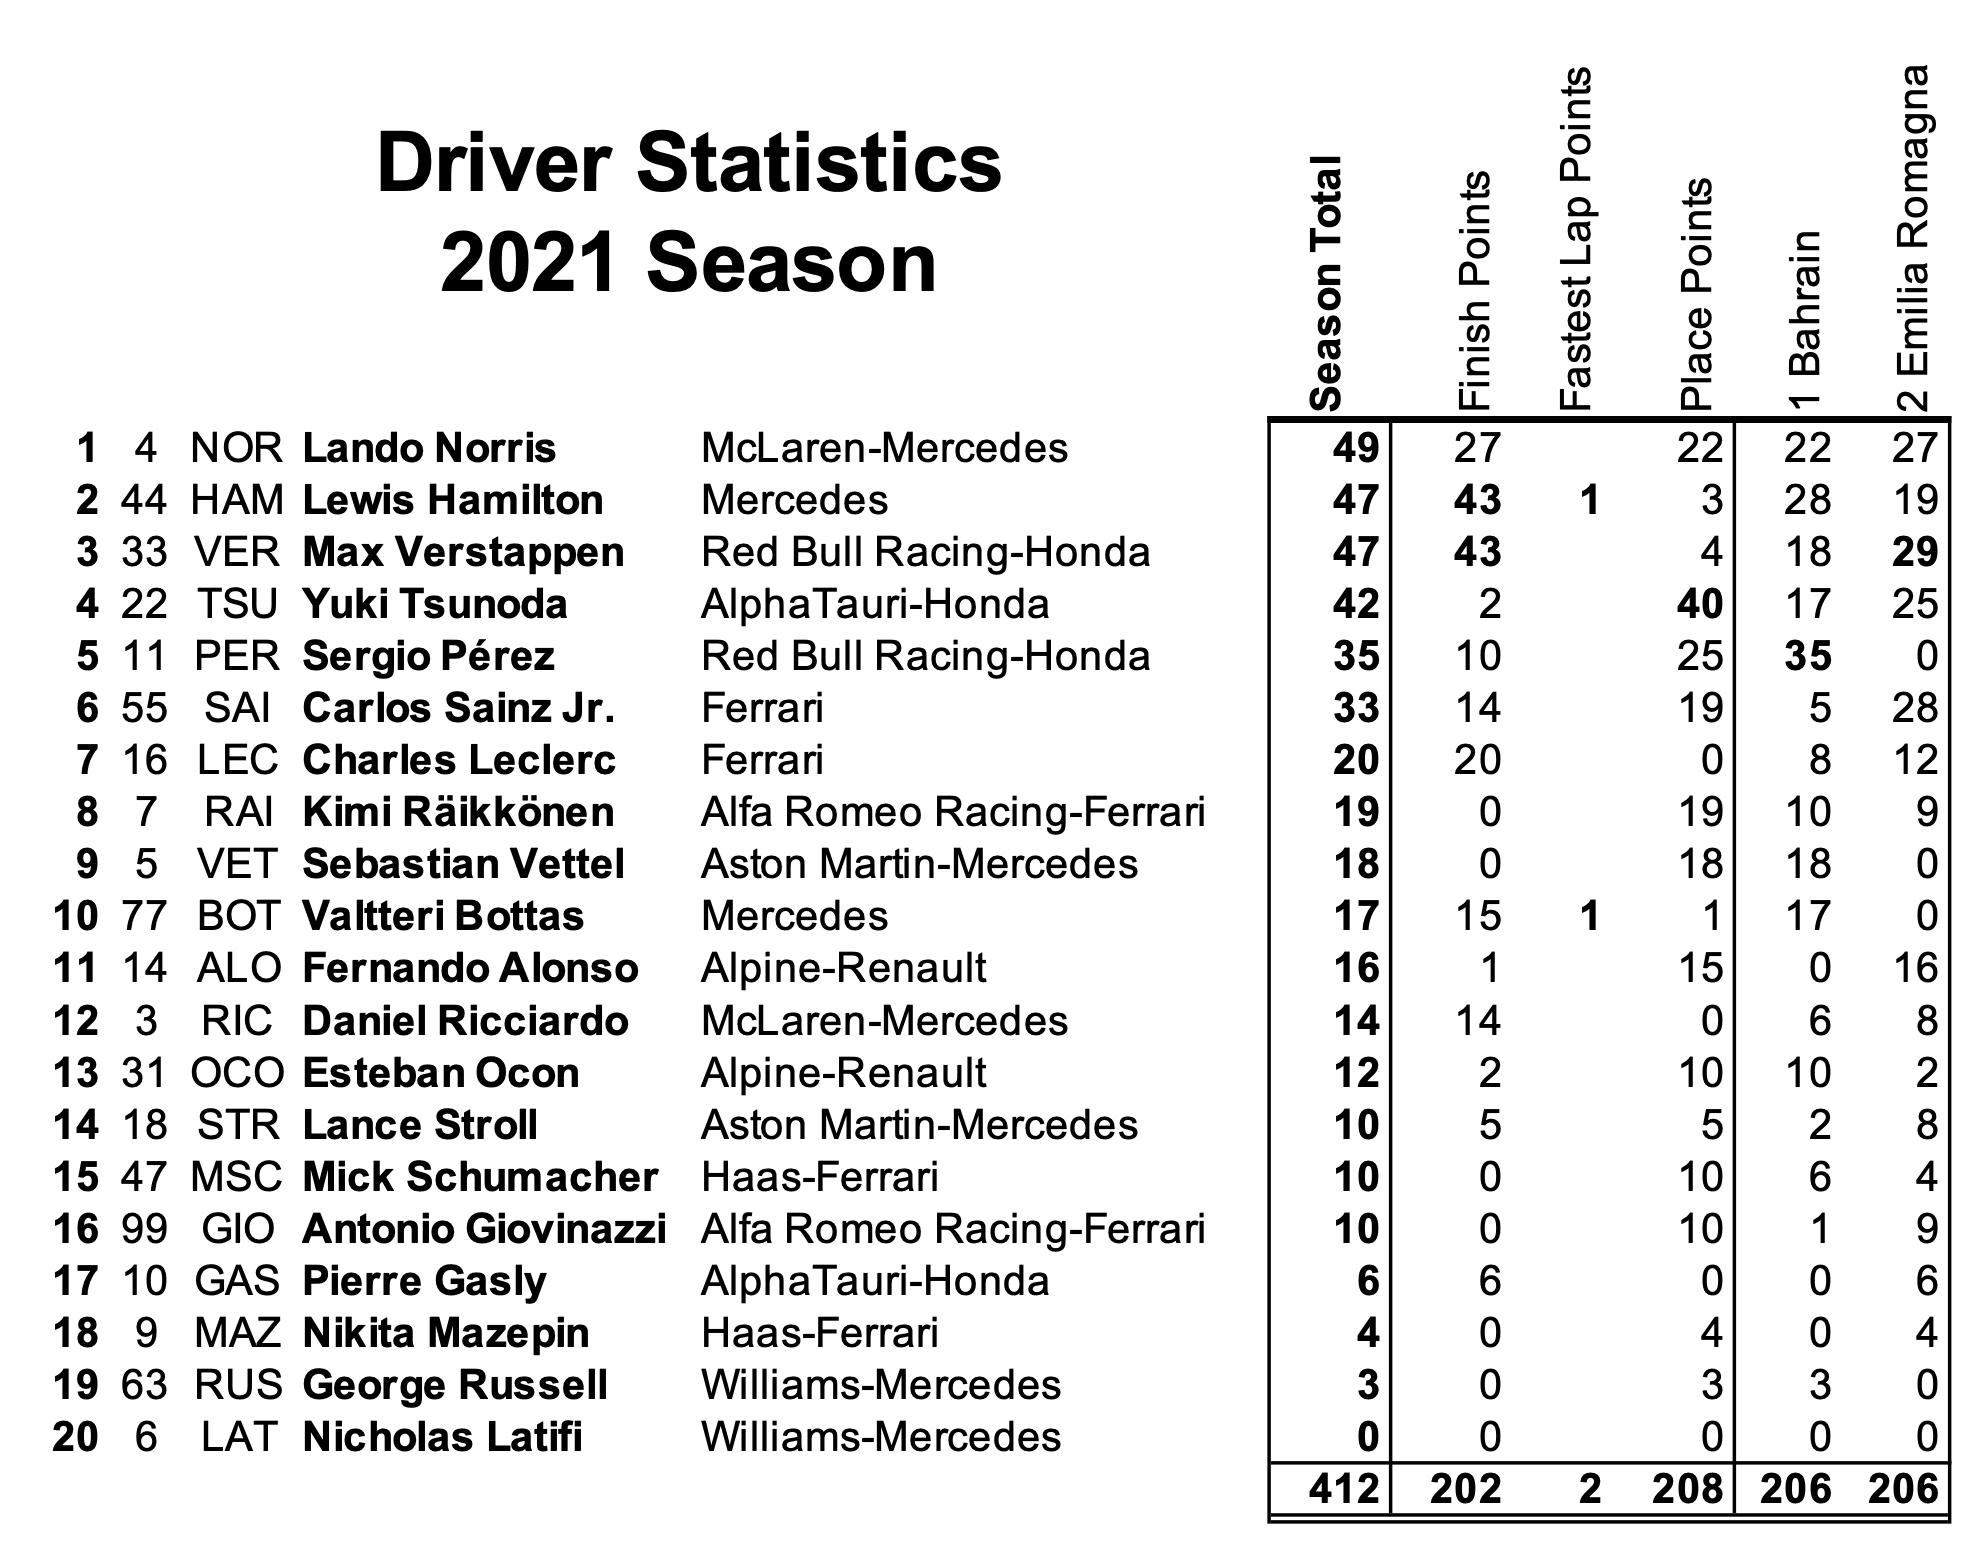 2 Drivers